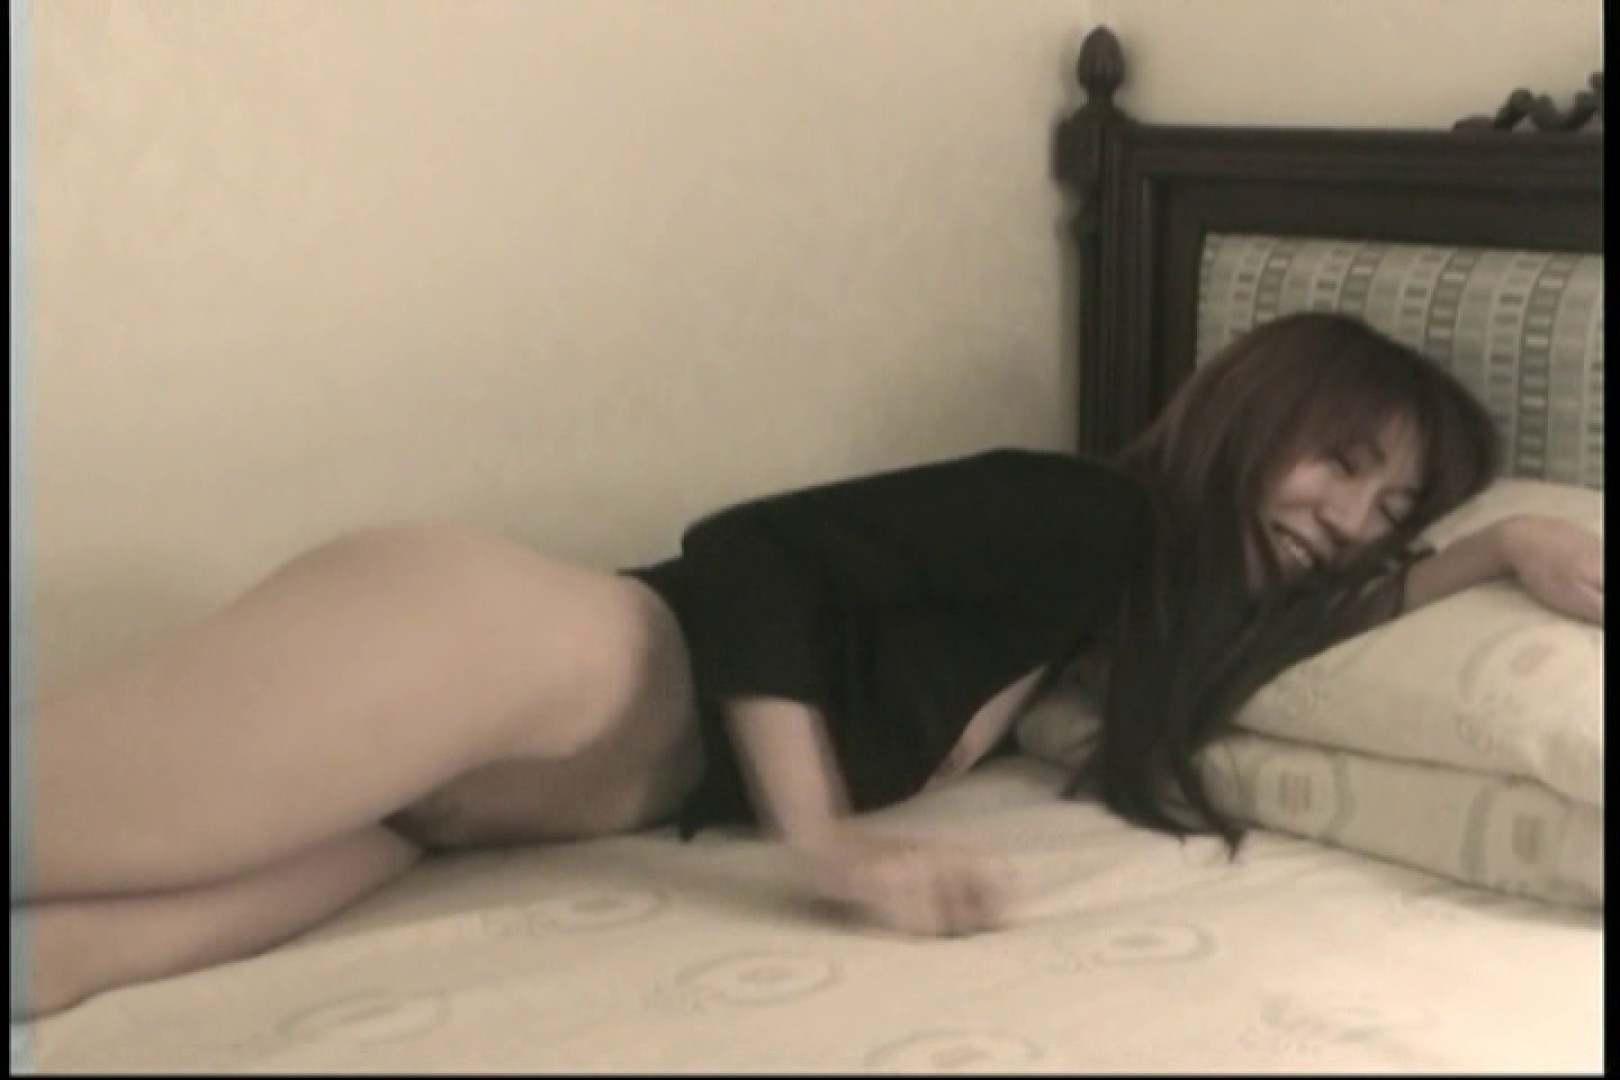 H大好きな清楚系の美ボディお姉さんとホテルでSEX~安西みか~ 電マ | ホテル  48連発 17